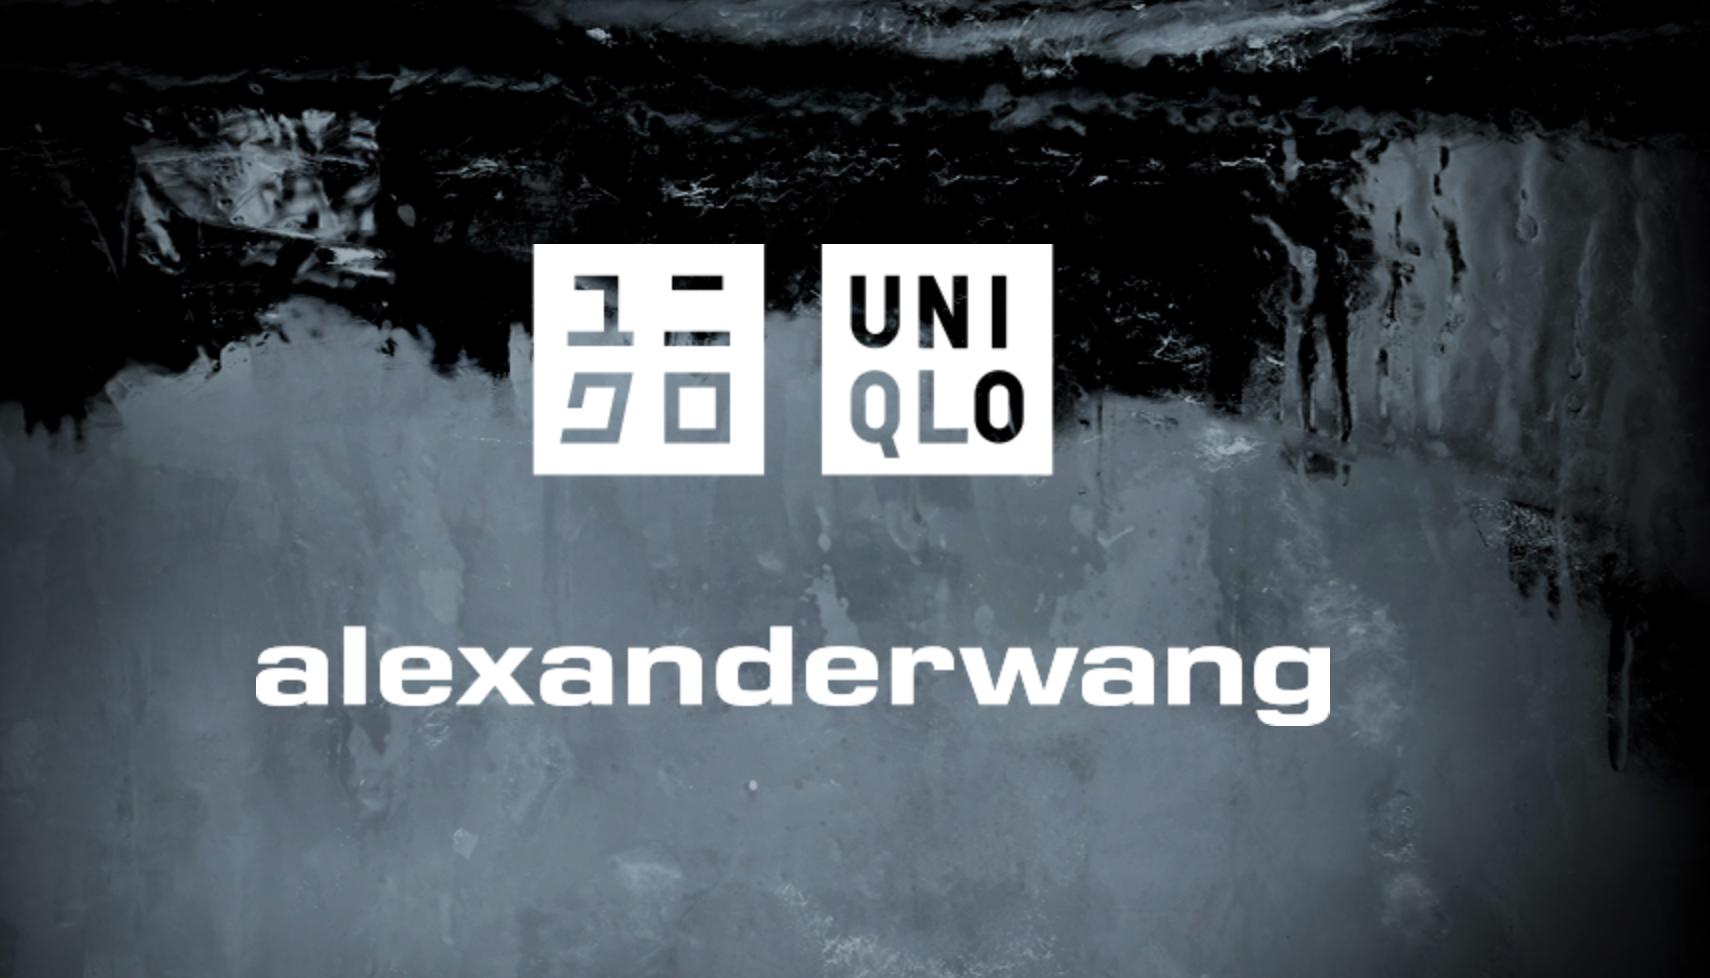 alexander wang heattech uniqlo